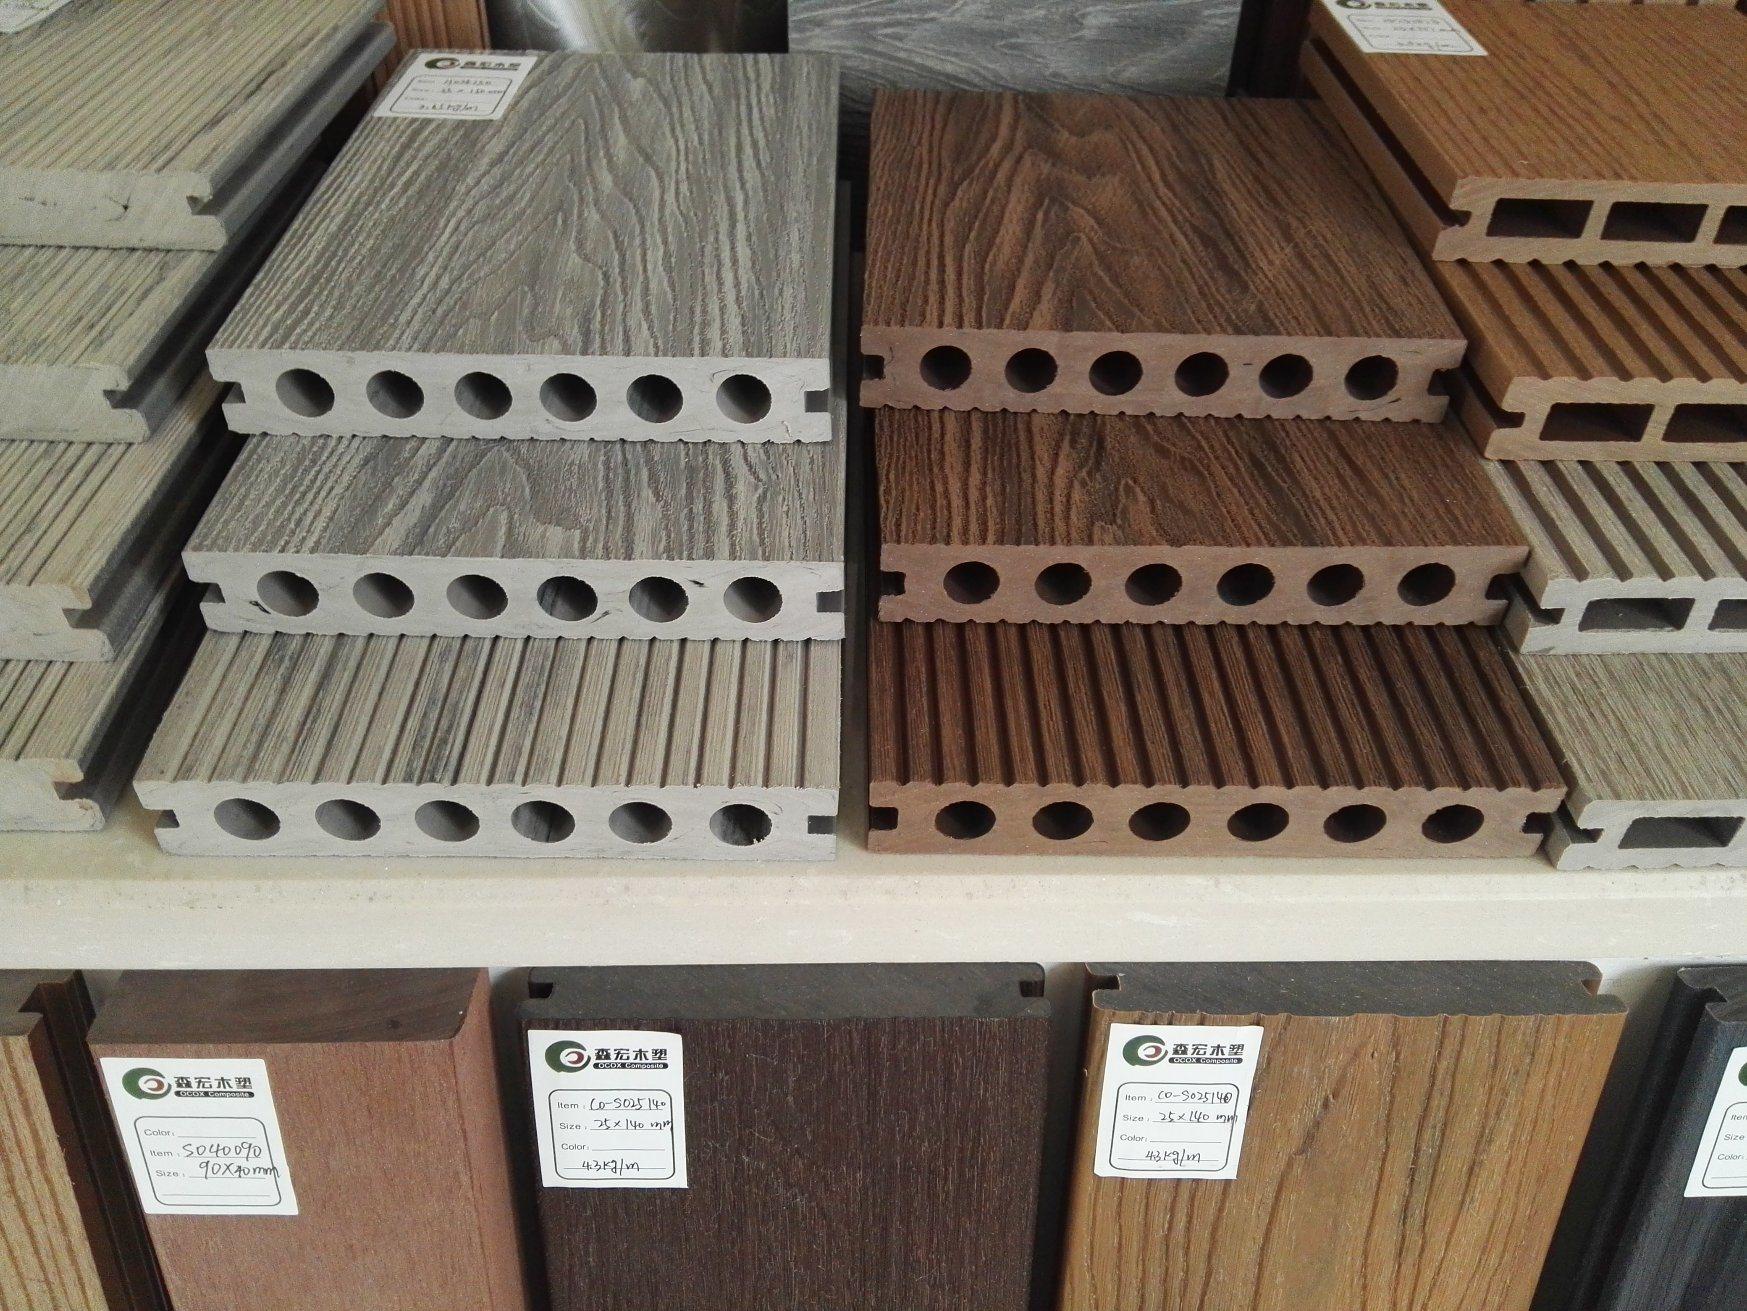 China Online Wood Grain Wpc Outdoor Composite Decking Woodgrain